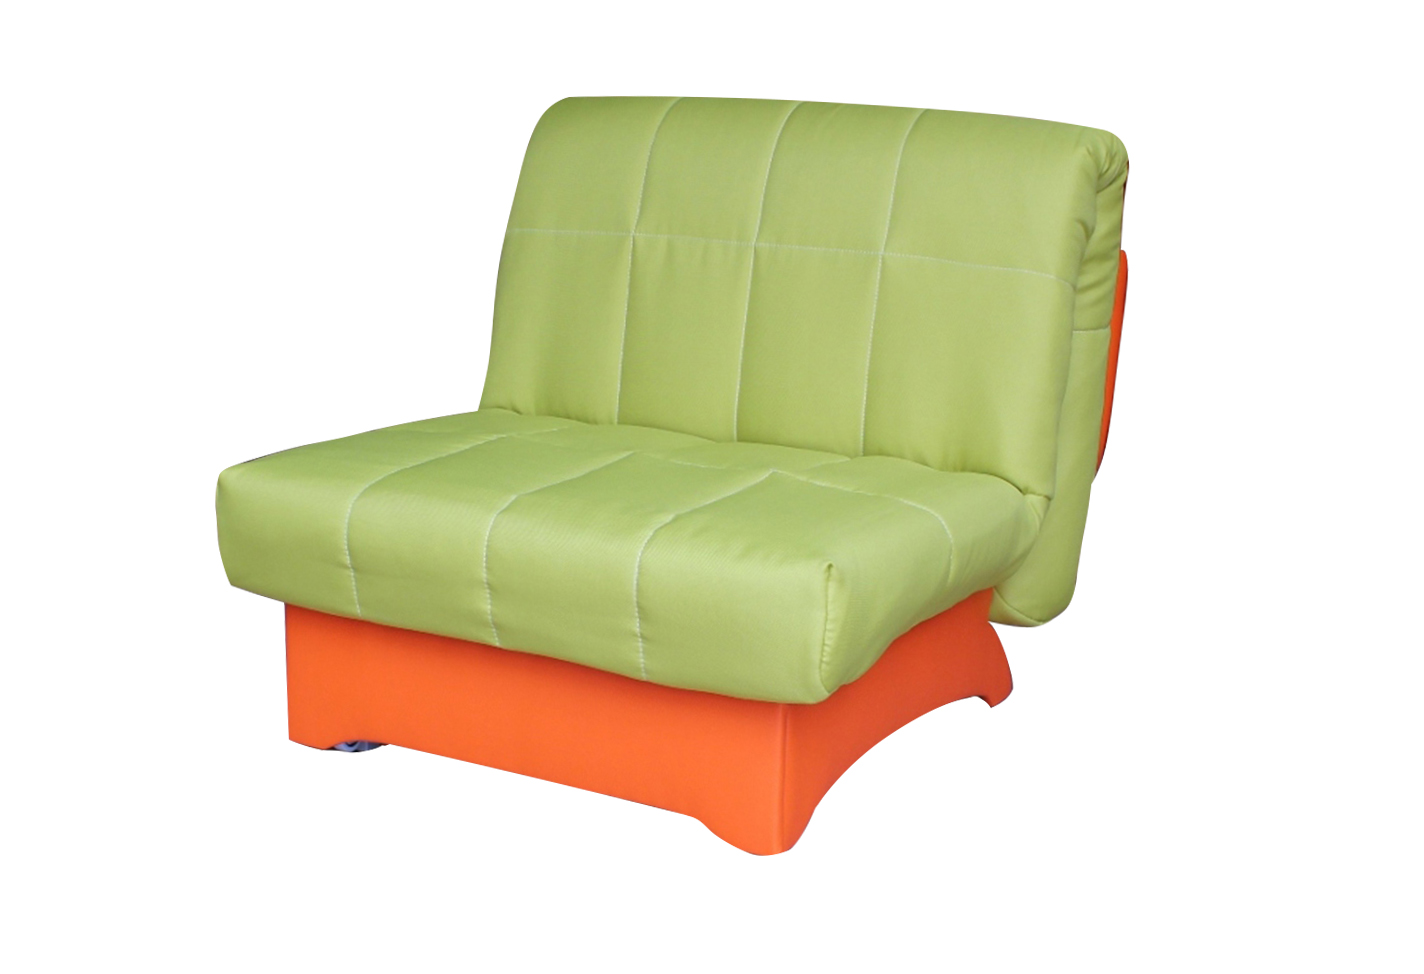 Кресло-кровать Аккорд-2 Neo apple Медиал